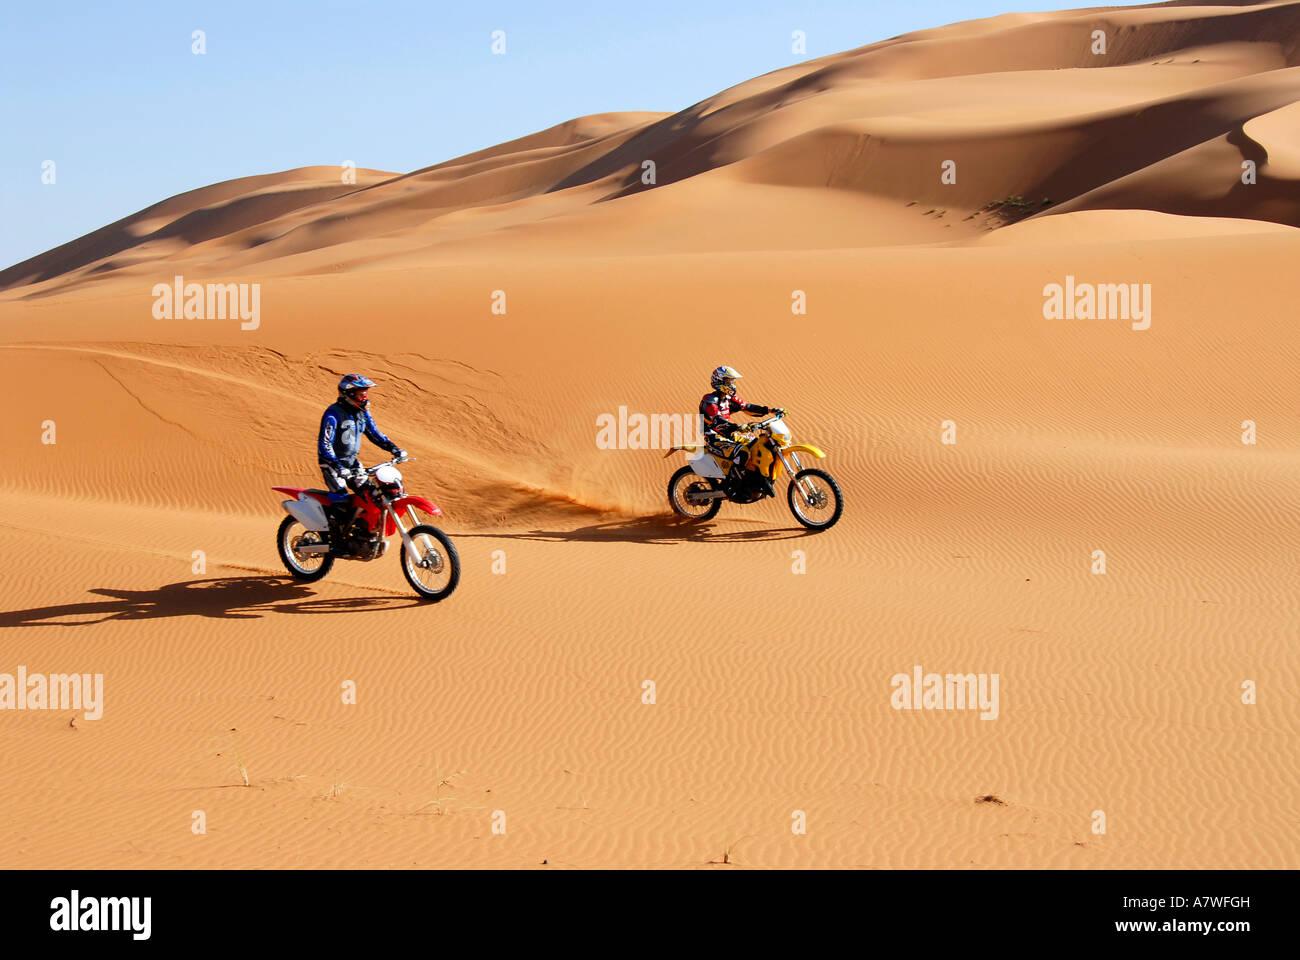 Two Moto Cross riders in sand dunes Erg Chebbi Merzouga Morocco - Stock Image